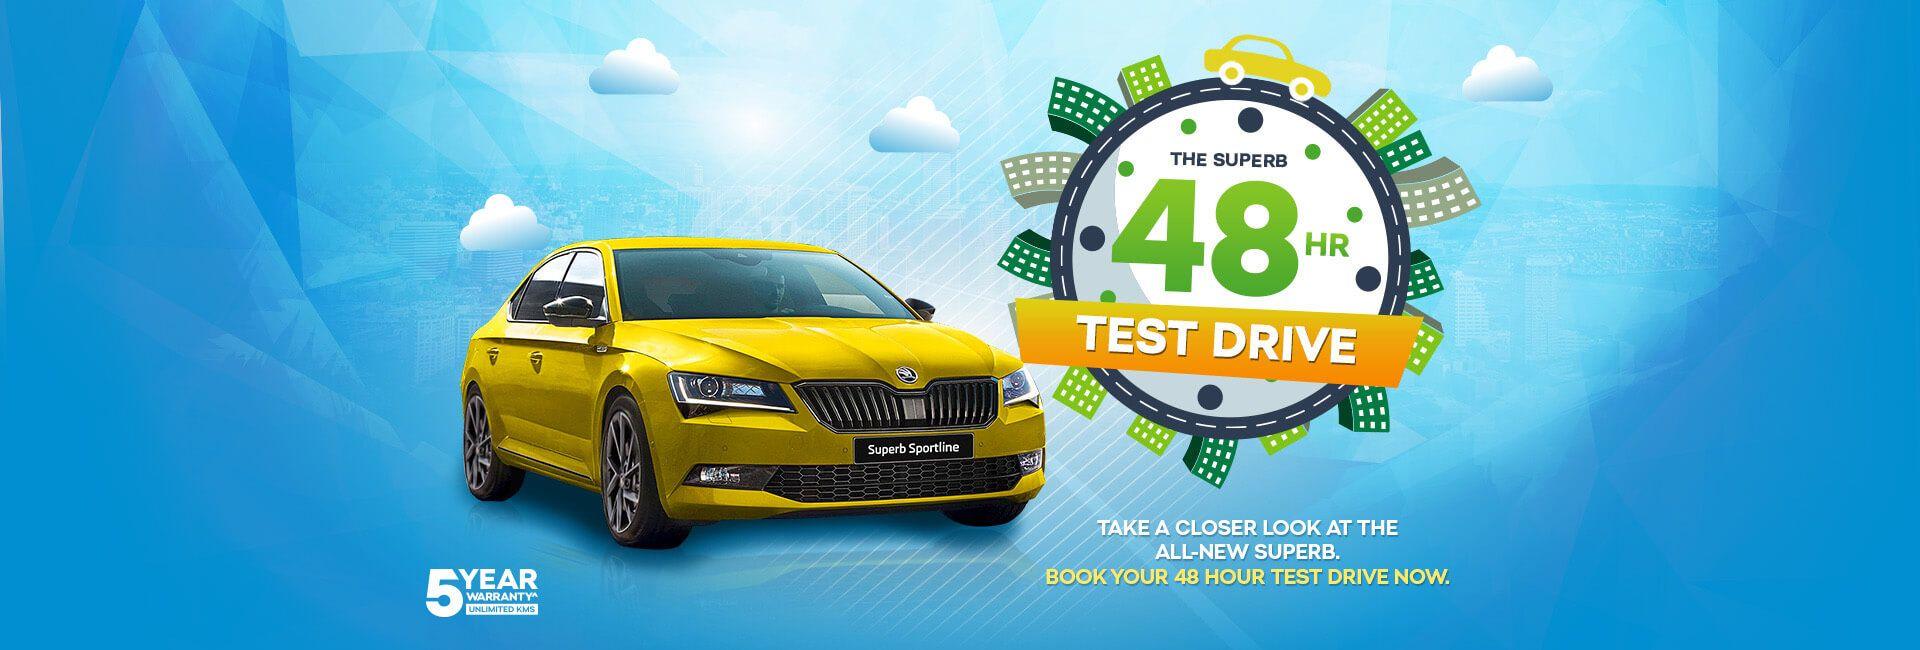 Skoda 48HR Test Drive